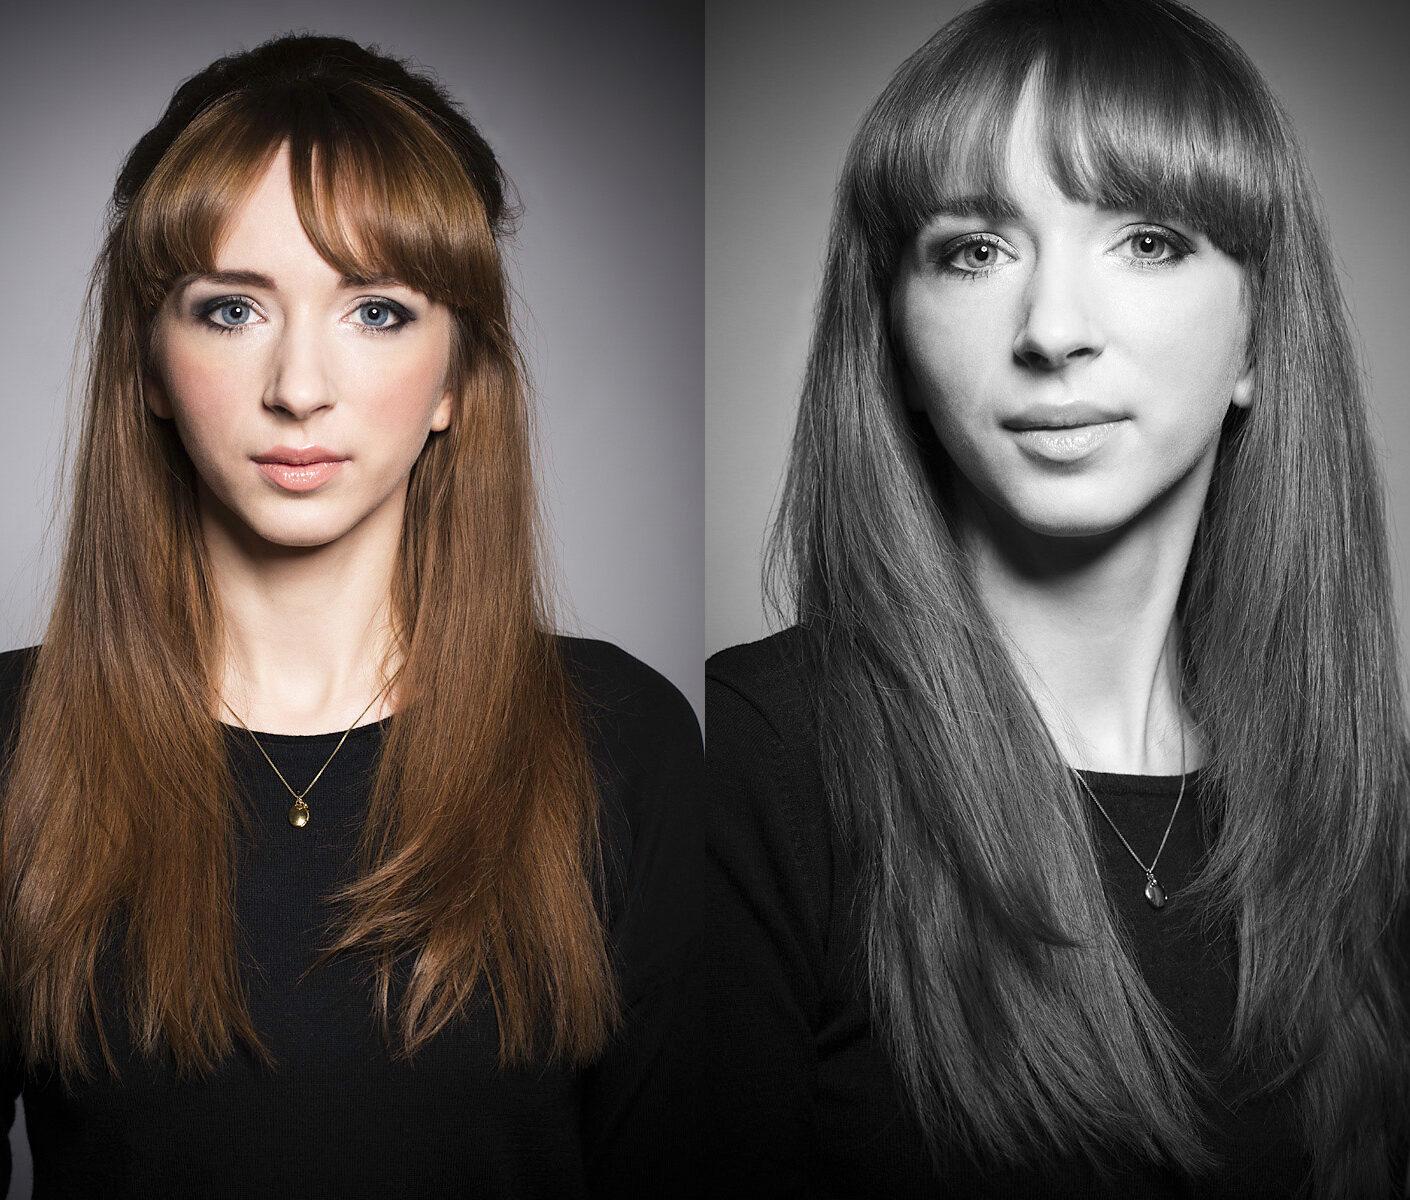 Photo: studio headshots portraits photography photographer photographers london